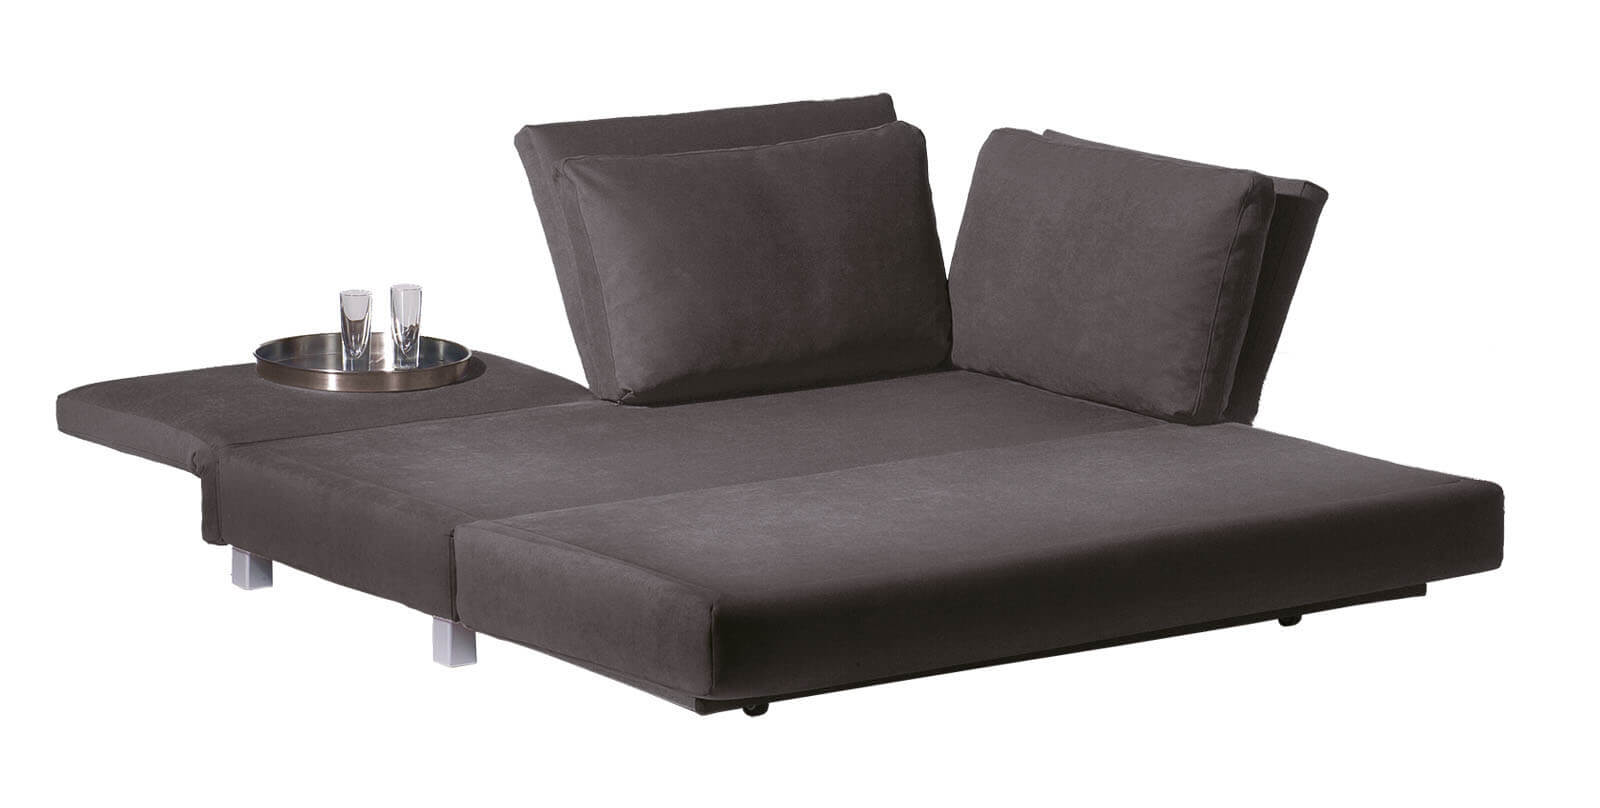 schlafsofa giorgio von franz fertig. Black Bedroom Furniture Sets. Home Design Ideas